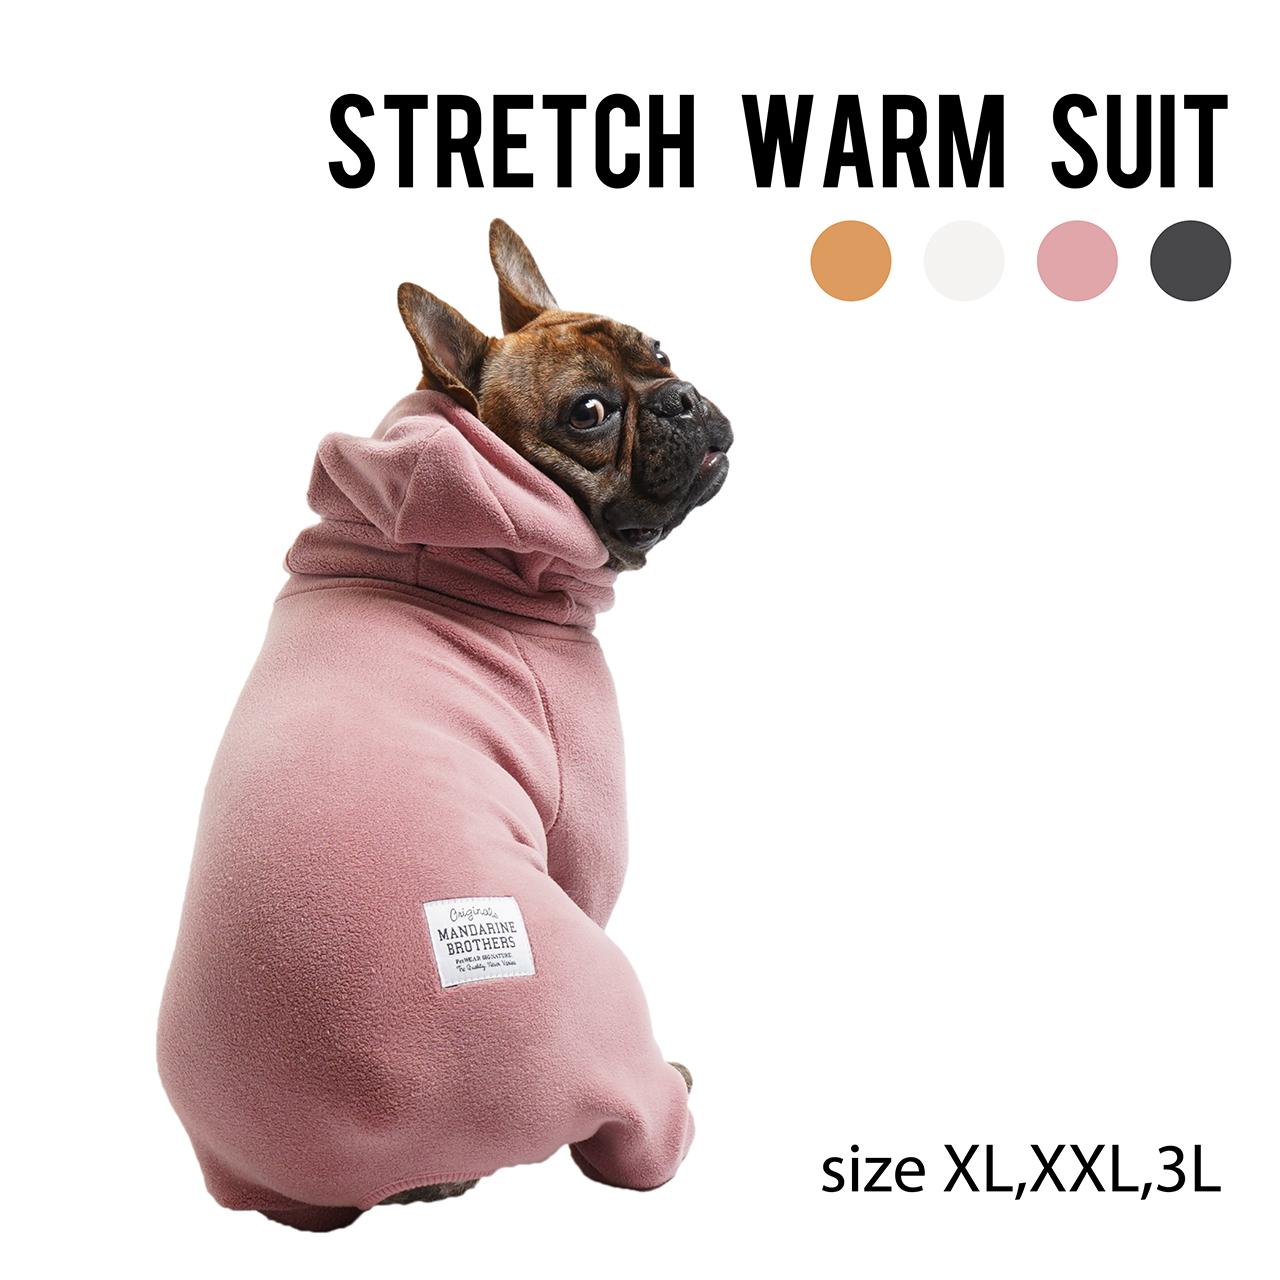 STRETCH WARM SUITS(XL,XXL,3L)ストレッチウォームスーツ